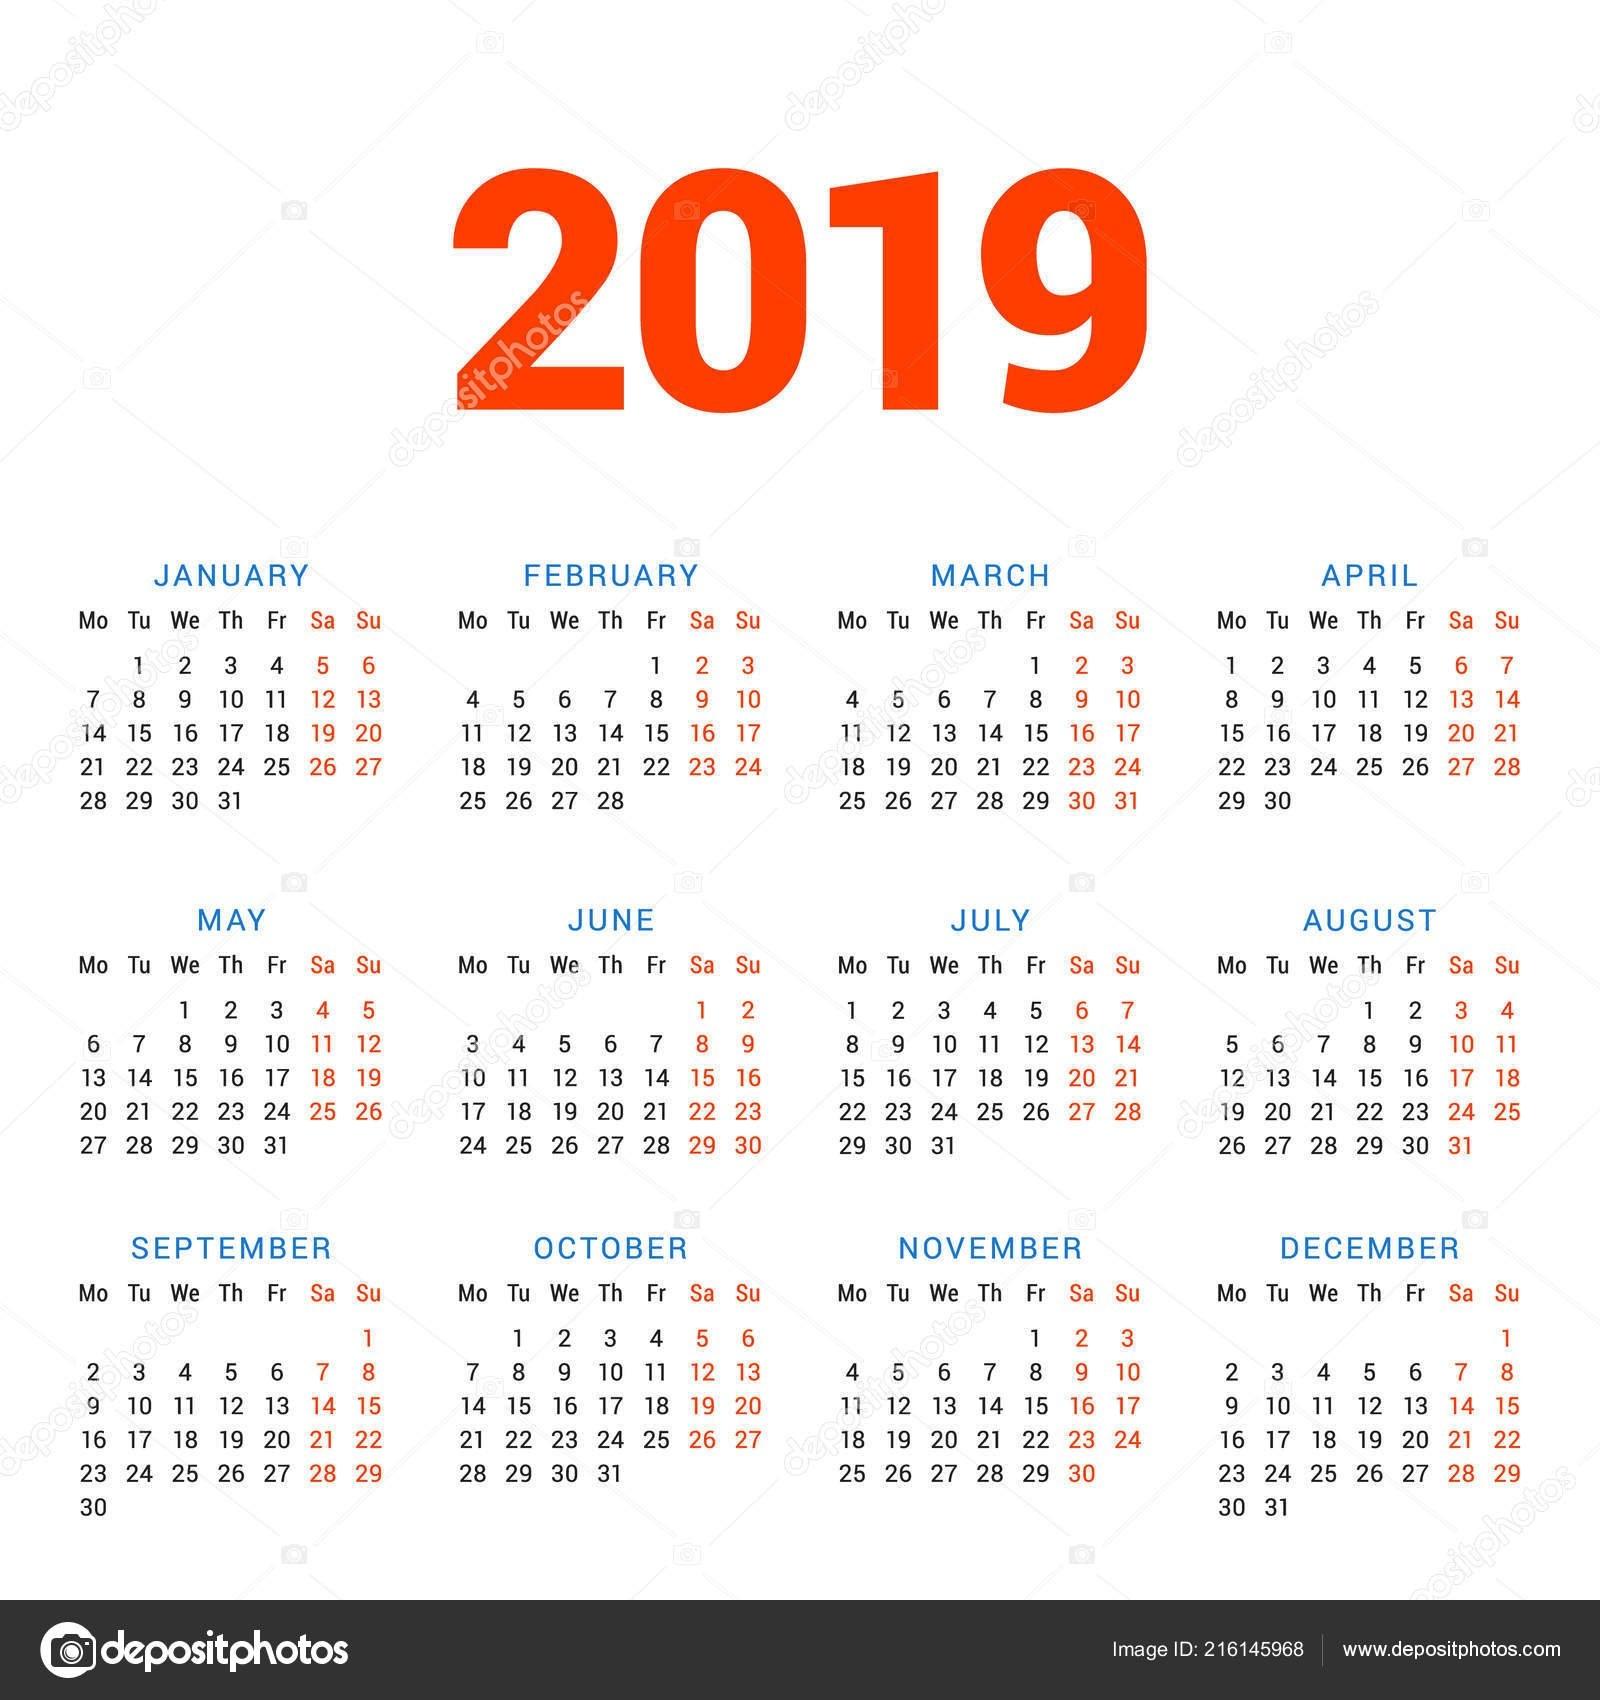 Calendar 2019 Year White Background Week Starts Monday Columns Rows 4 Weekly Pay Calendar 2019